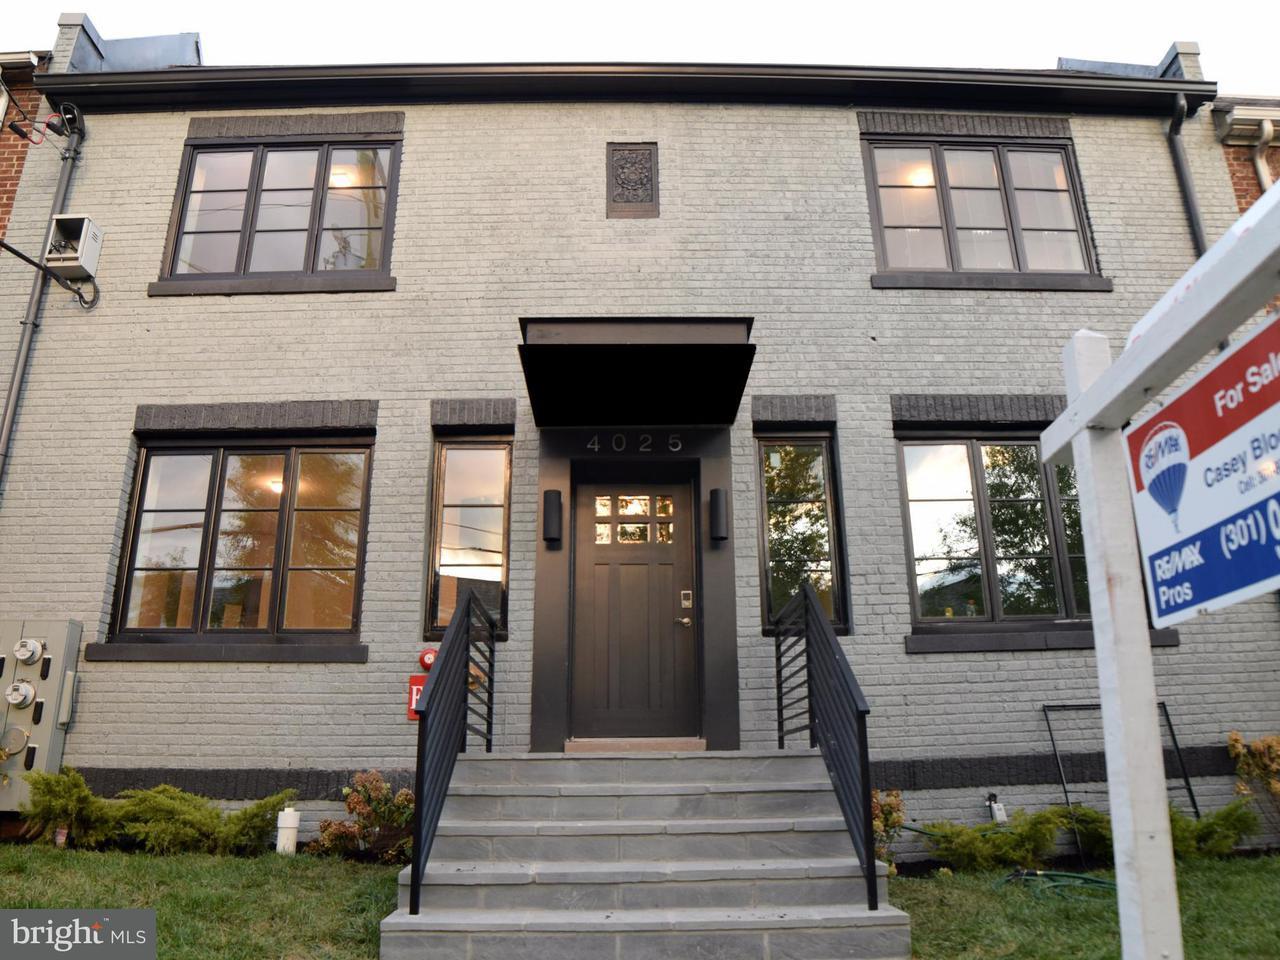 Casa unifamiliar adosada (Townhouse) por un Venta en 4025 7TH ST NE #2 4025 7TH ST NE #2 Washington, Distrito De Columbia 20017 Estados Unidos